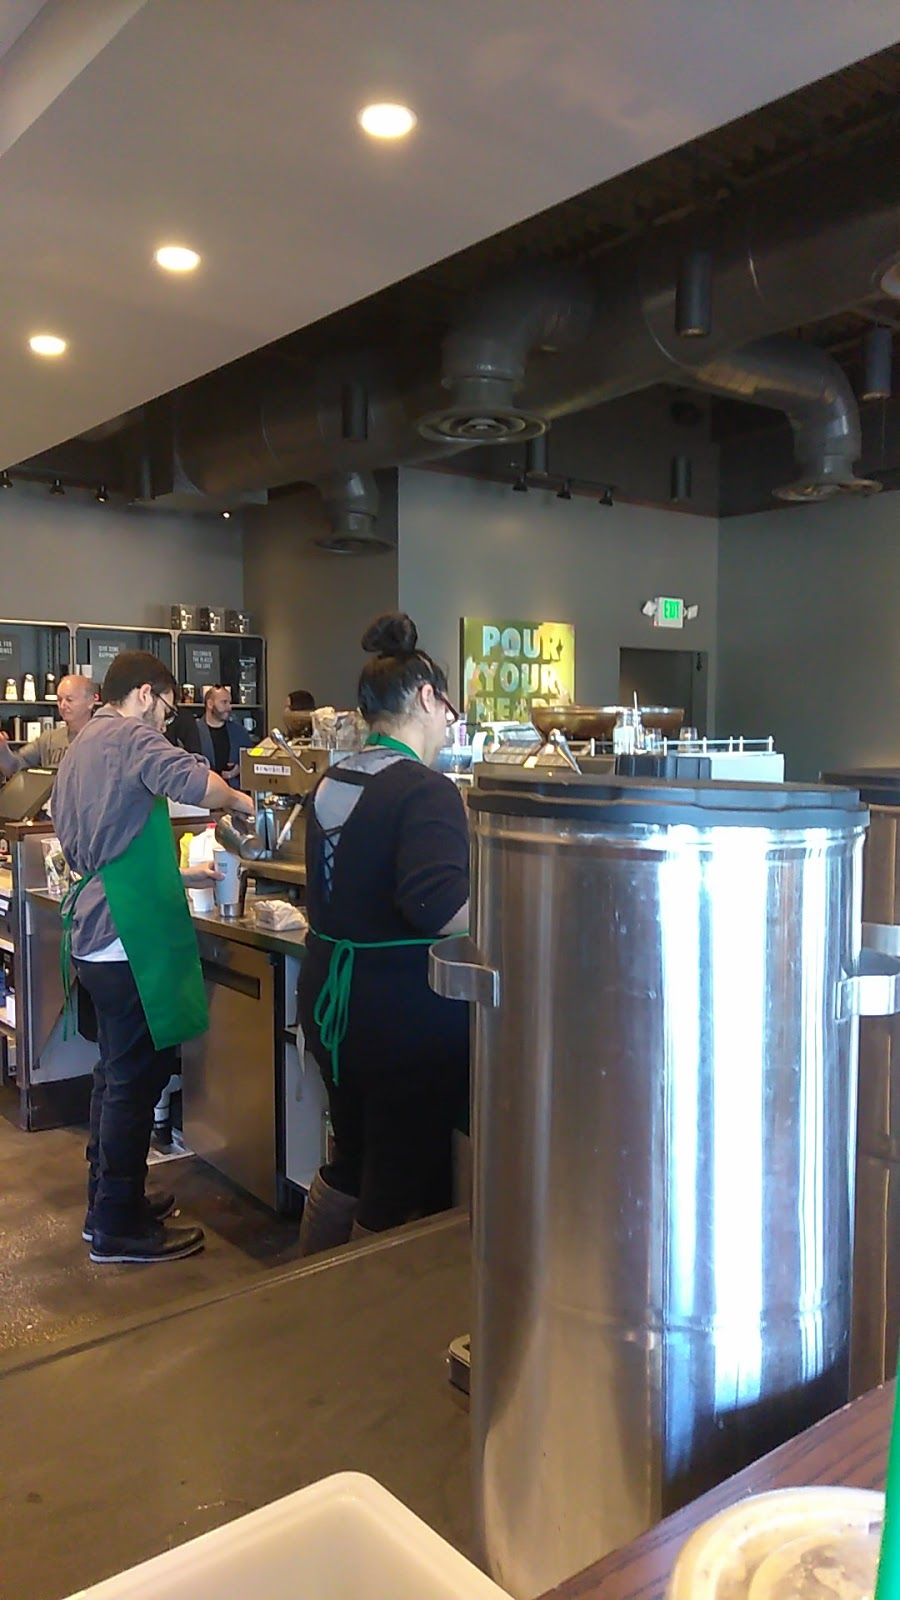 Starbucks - cafe  | Photo 10 of 10 | Address: 2914 Little Rd, Trinity, FL 34655, USA | Phone: (727) 375-0163